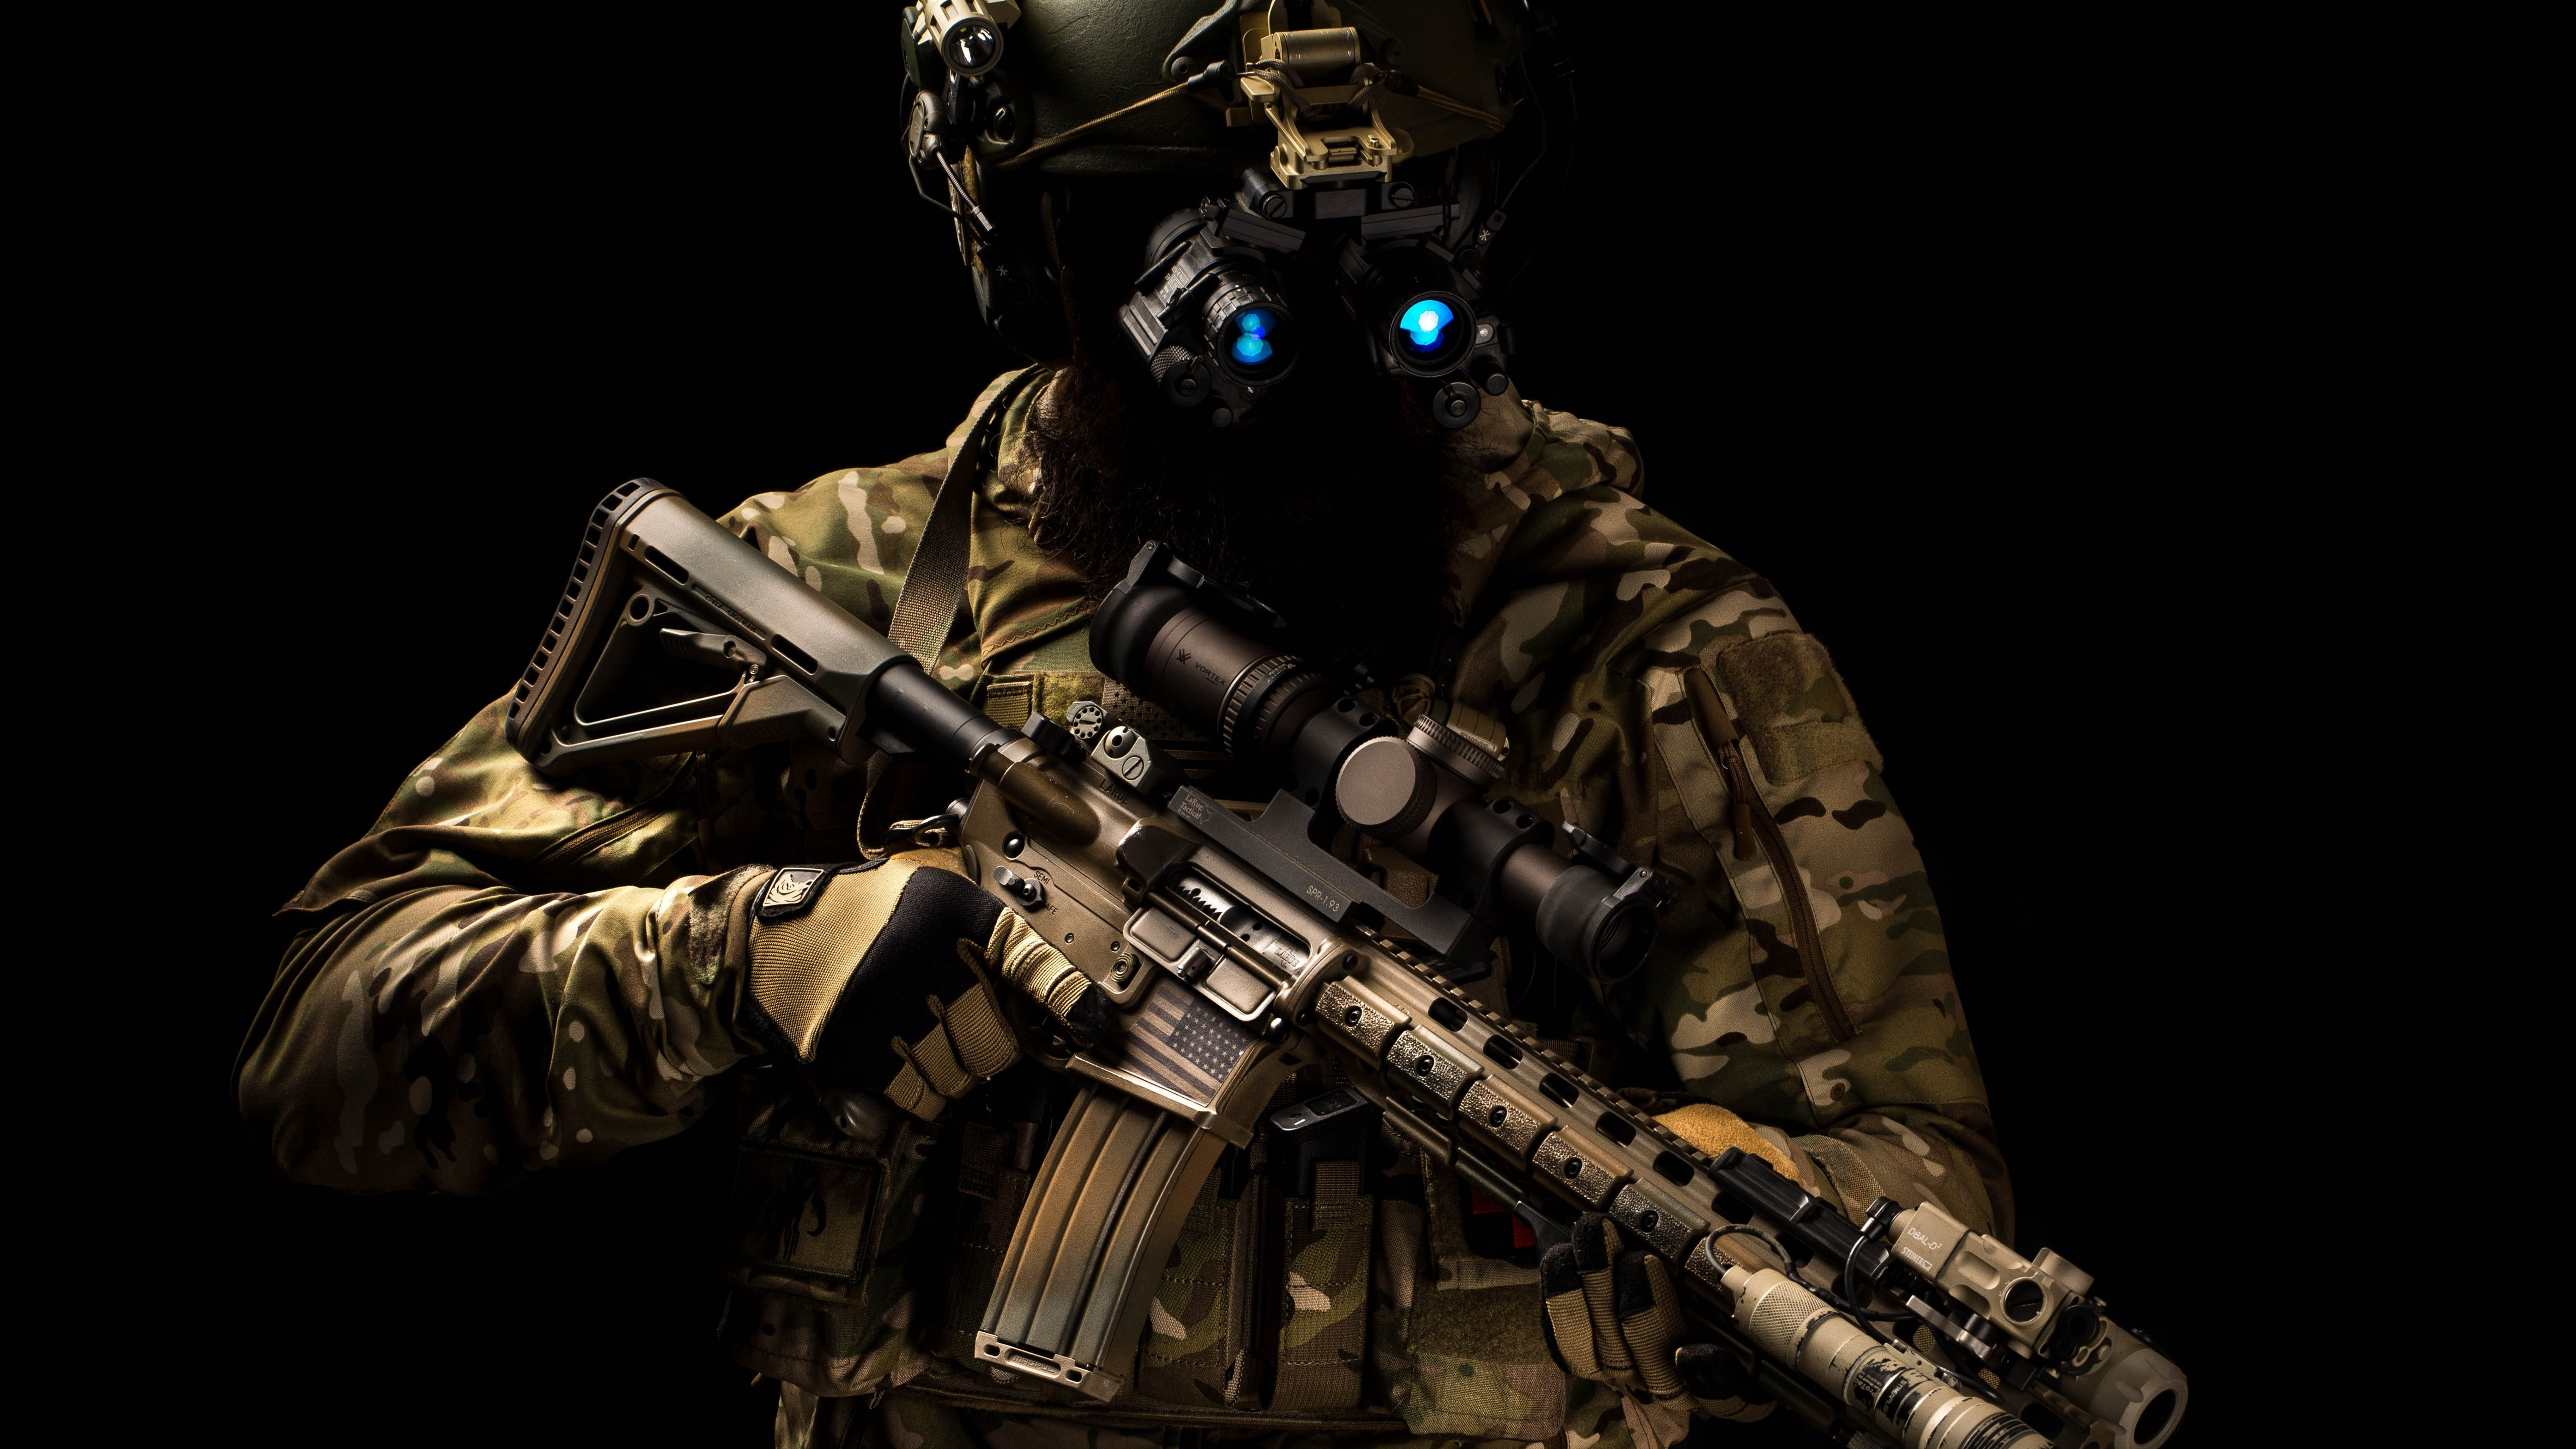 Special Forces Helmet Assault Rifle 1242x2688 Iphone 11 Pro Xs